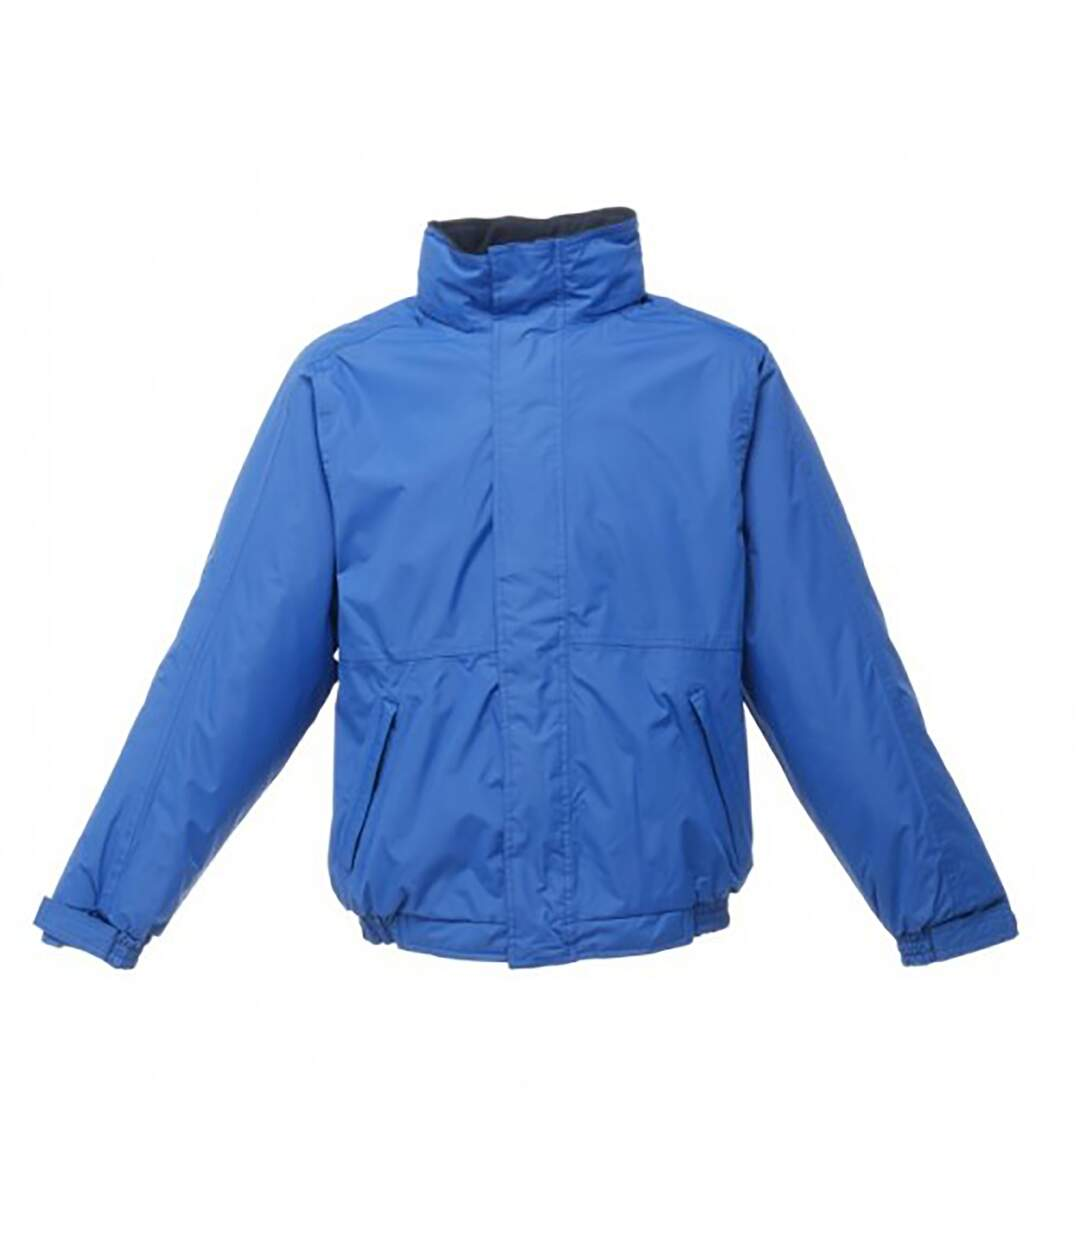 Regatta Dover Waterproof Windproof Jacket (Thermo-Guard Insulation) (Royal/Dark Navy) - UTBC839